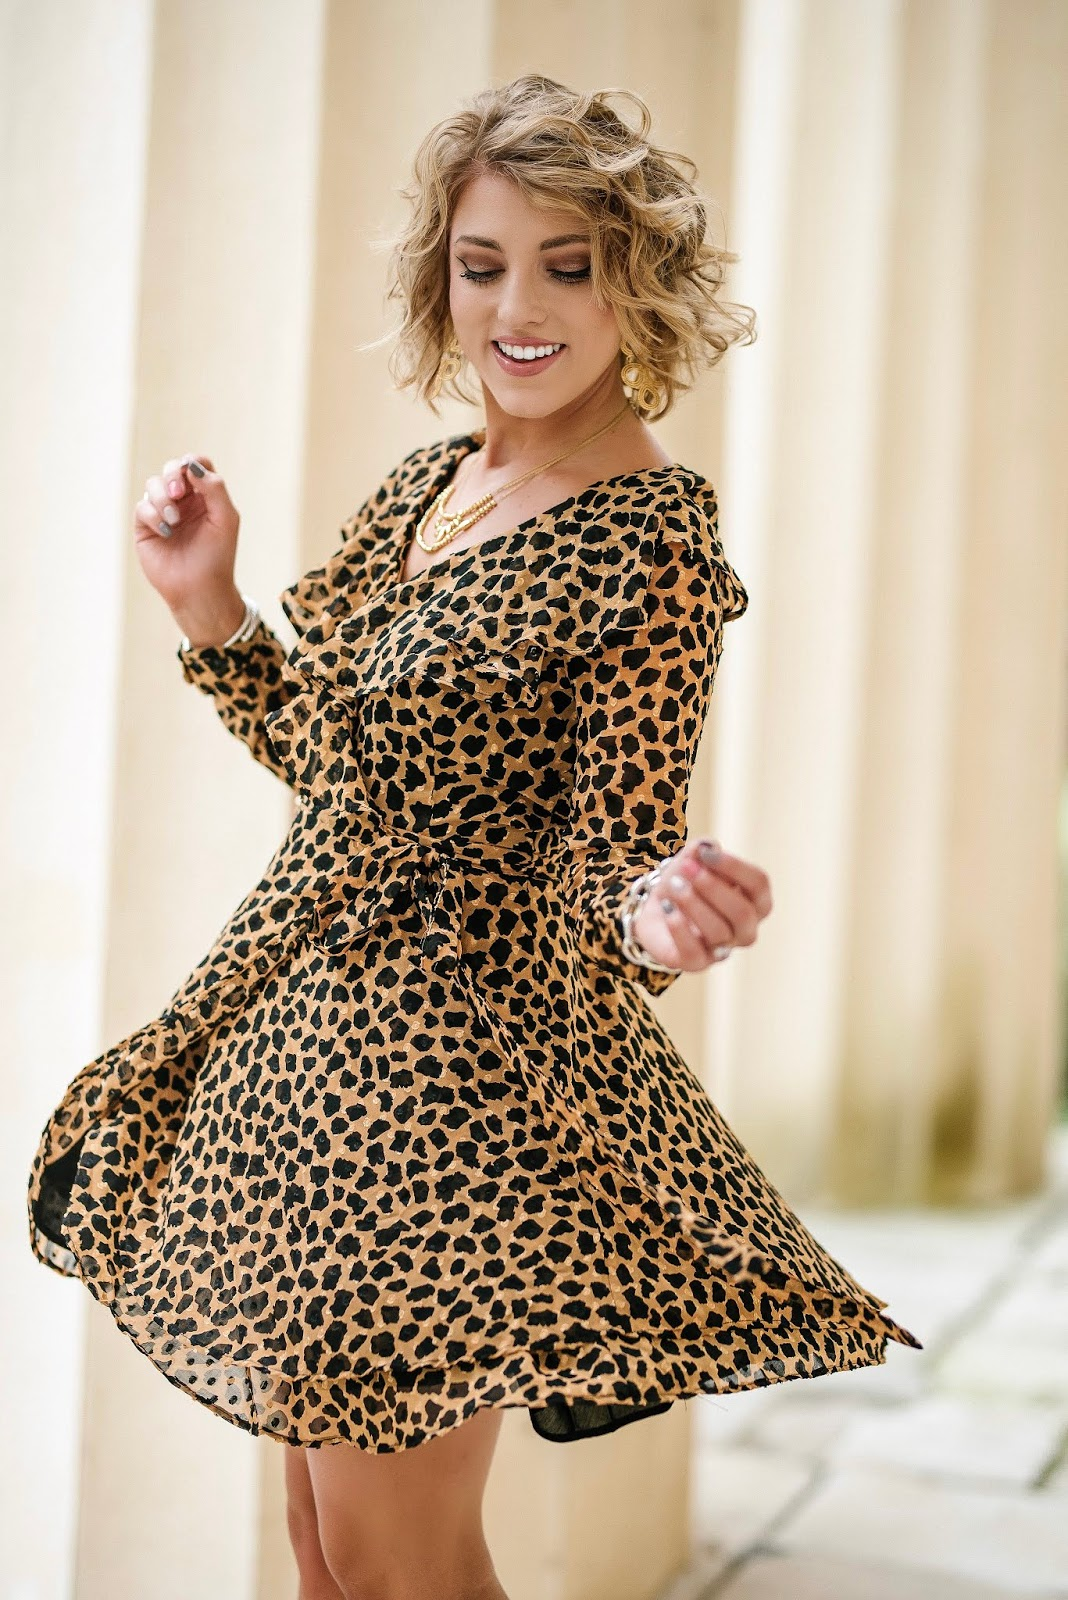 A Dress You'll Want To Twirl In: Free People Leopard Wrap Dress - Something Delightful Blog @racheltimmerman